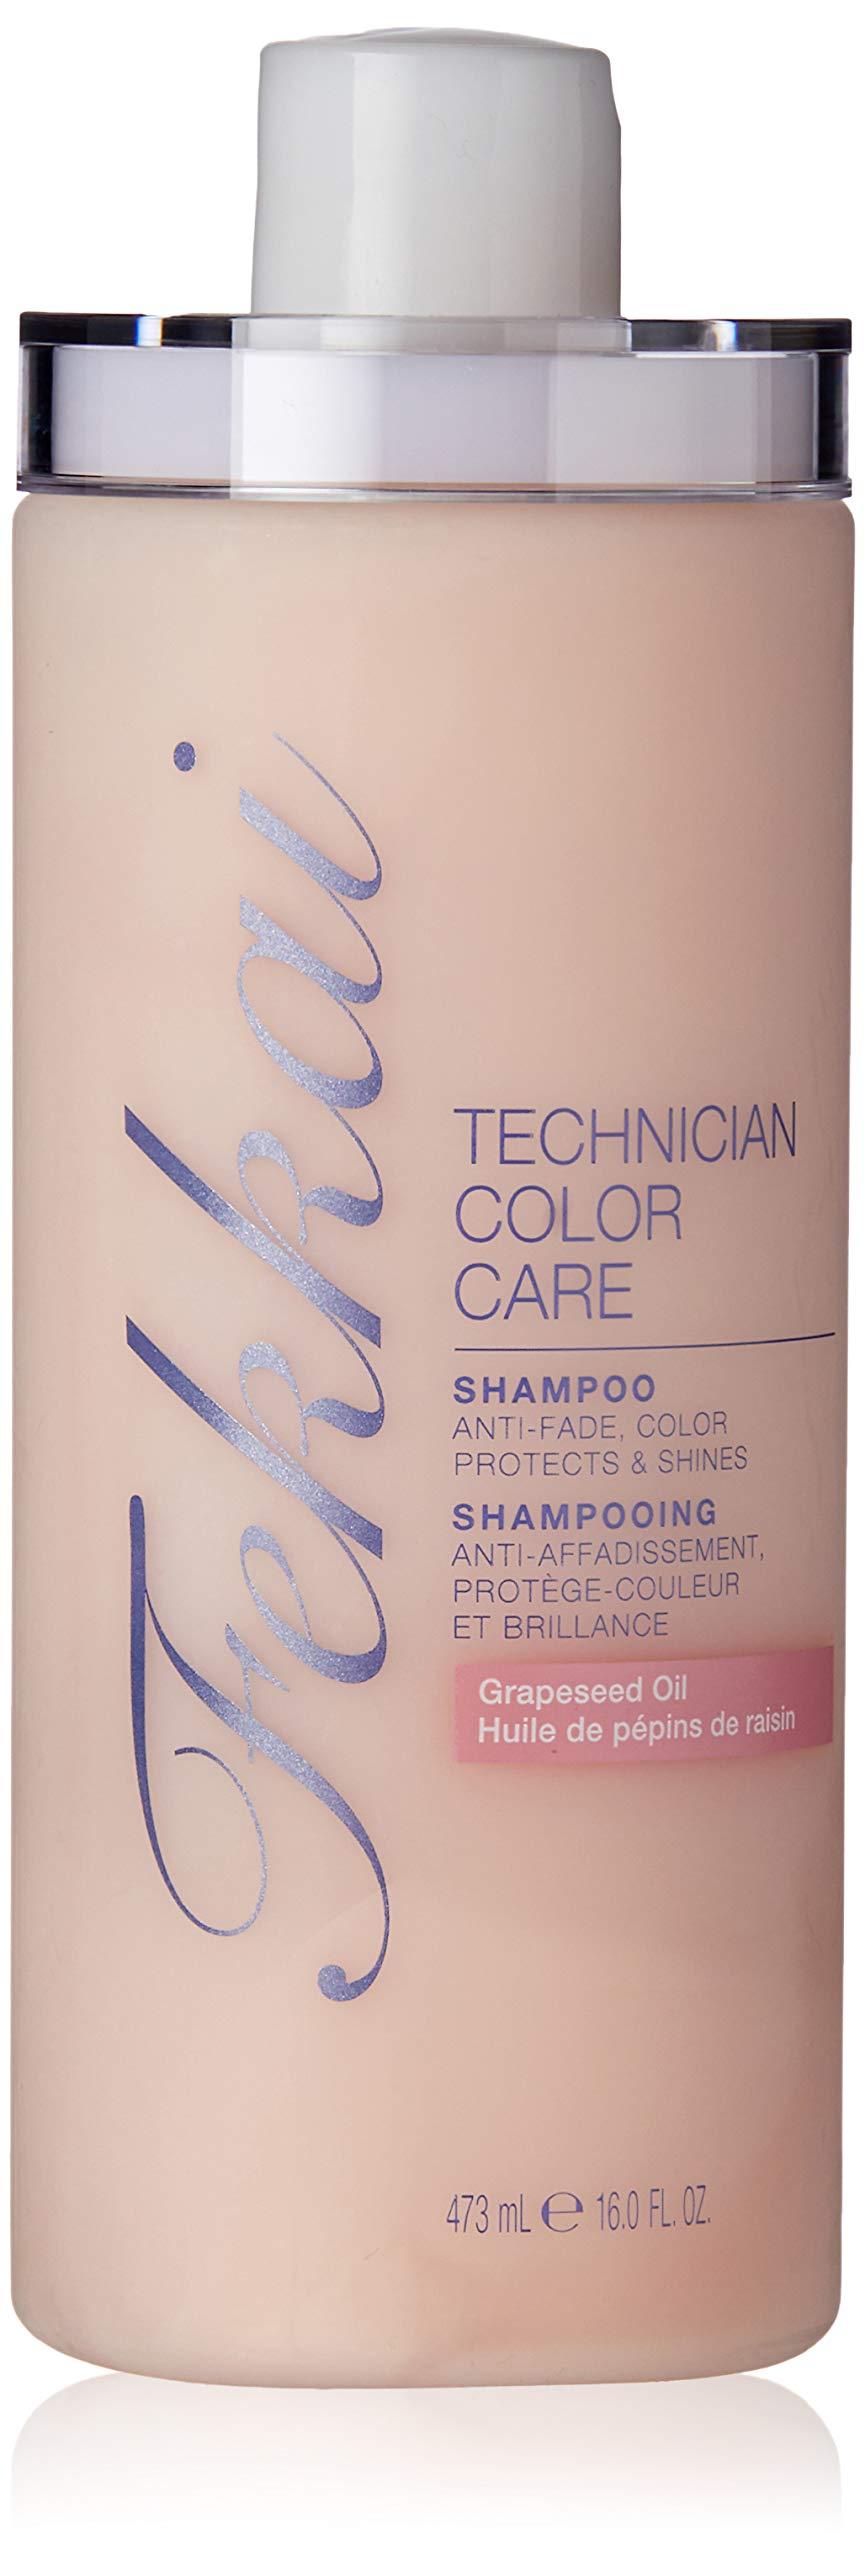 Fekkai Technician Color Care Shampoo, 16 Fluid Ounce